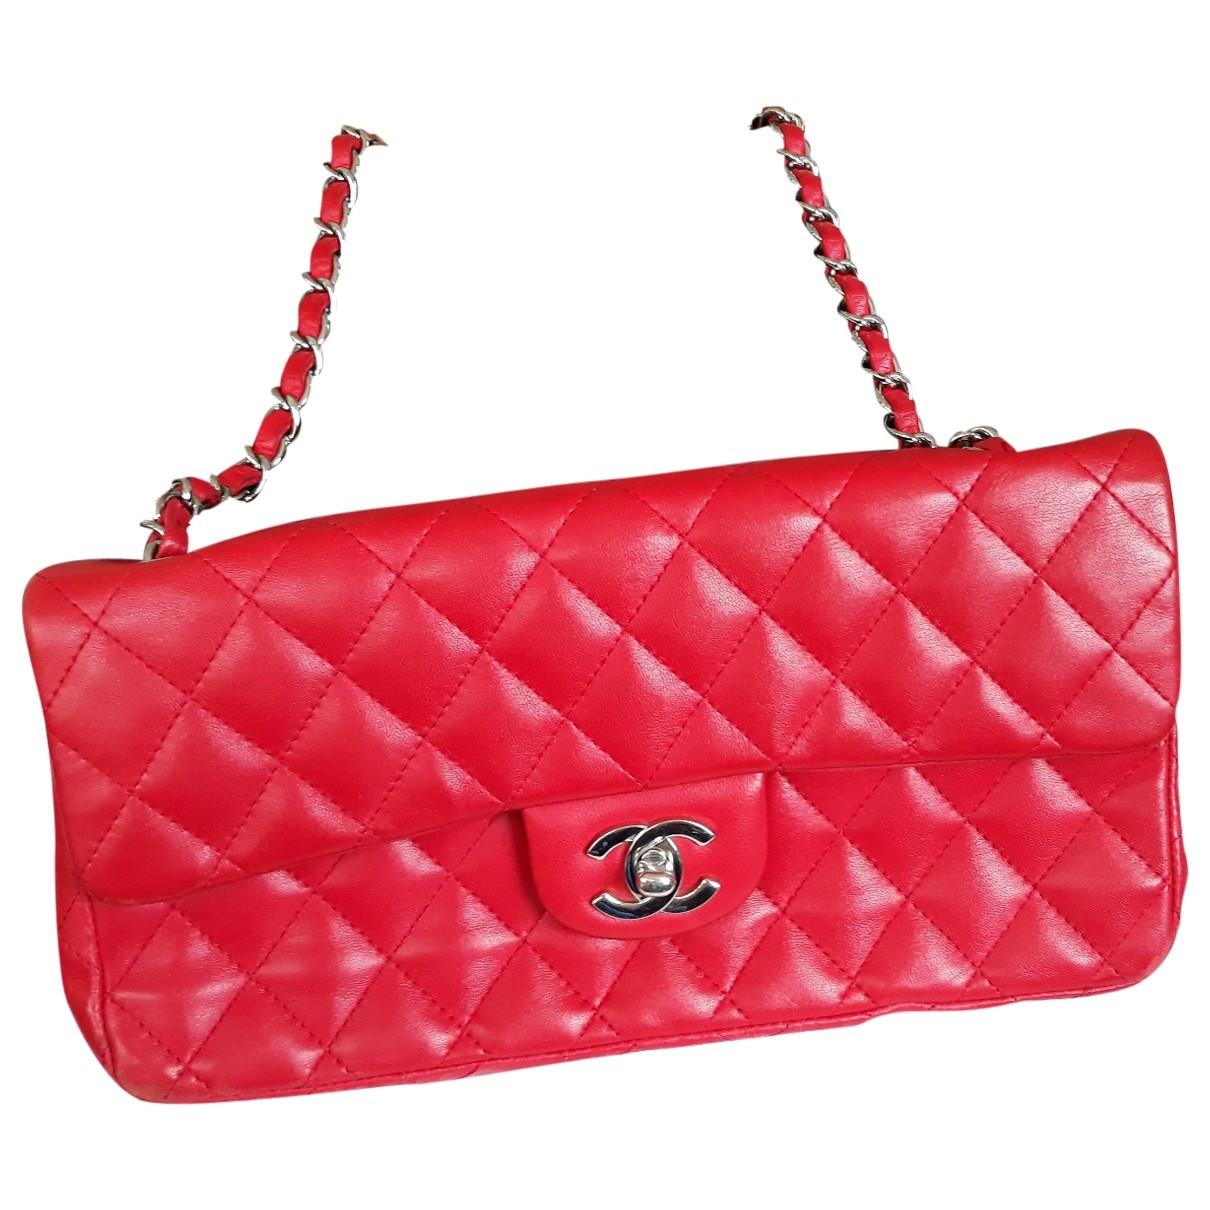 Chanel Timeless/Classique Handtasche in  Rot Leder